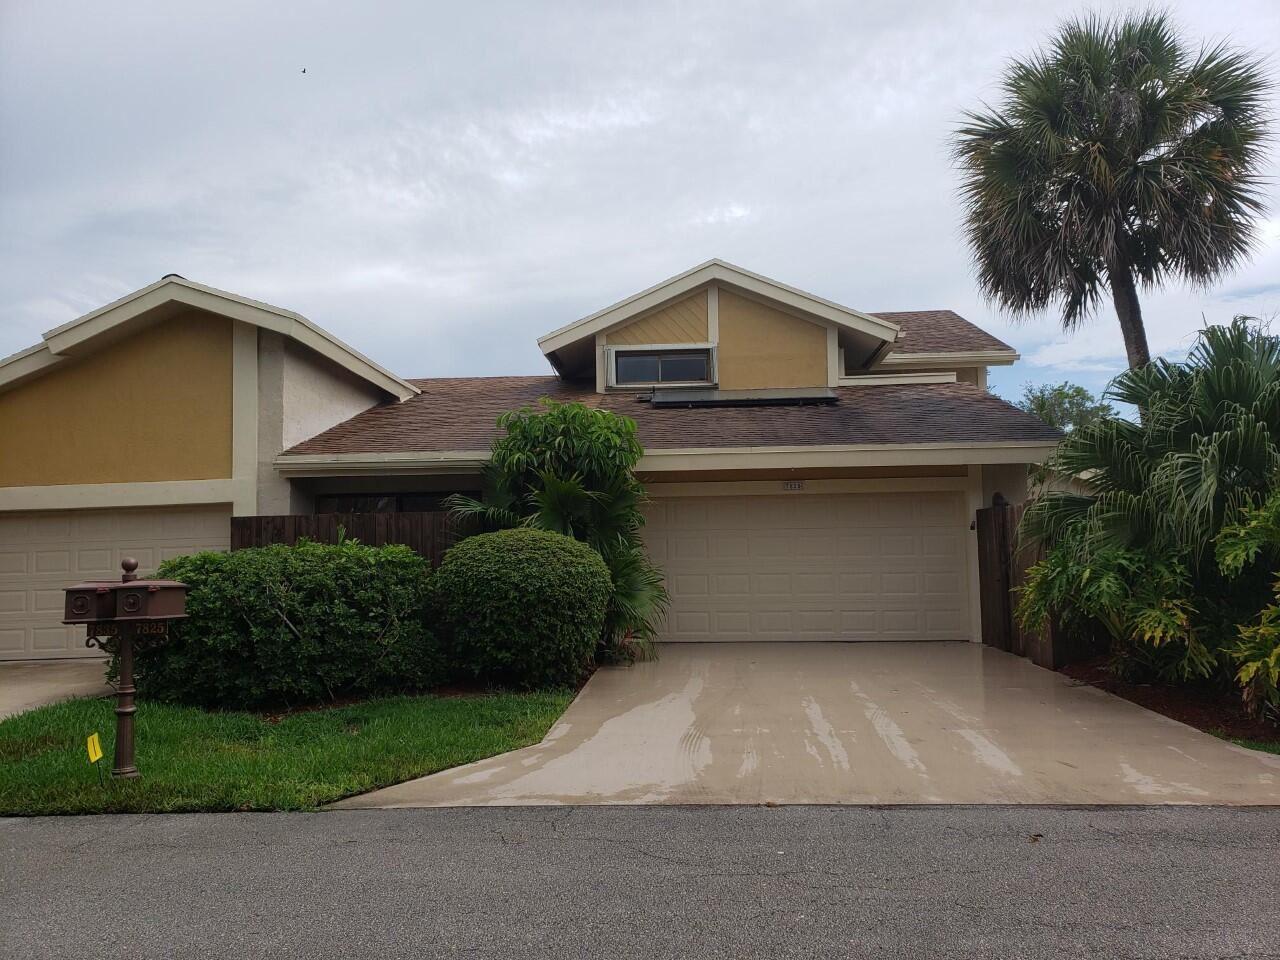 7825 Stanway Place W, Boca Raton, FL 33433 - MLS#: RX-10728303